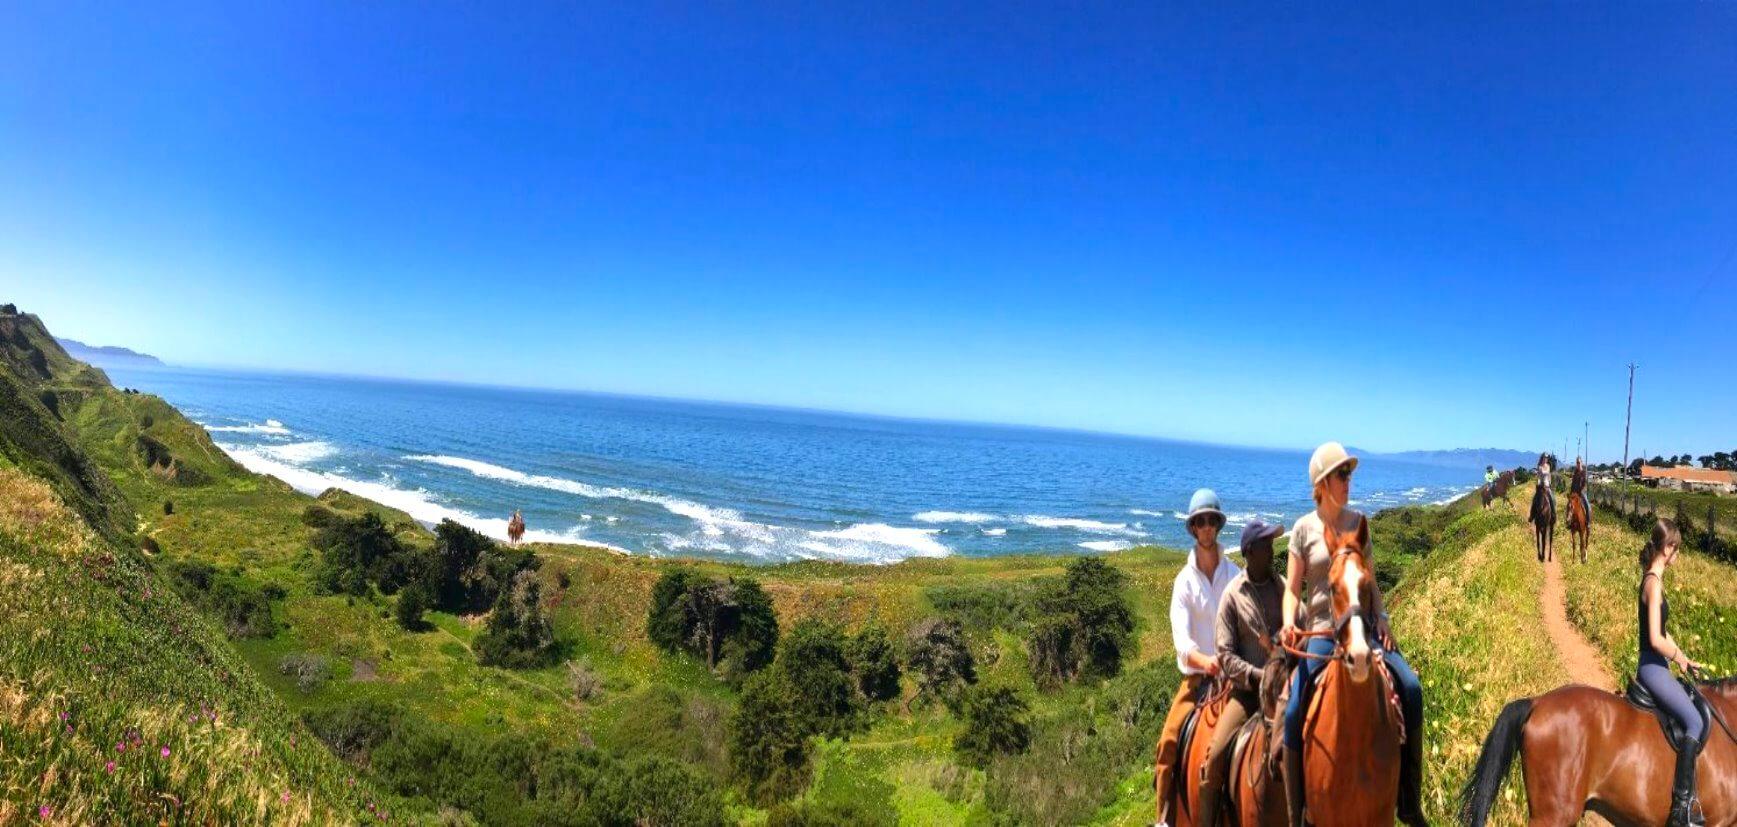 awesome_horseback_rides_on_the_beach_neary_san_francisco